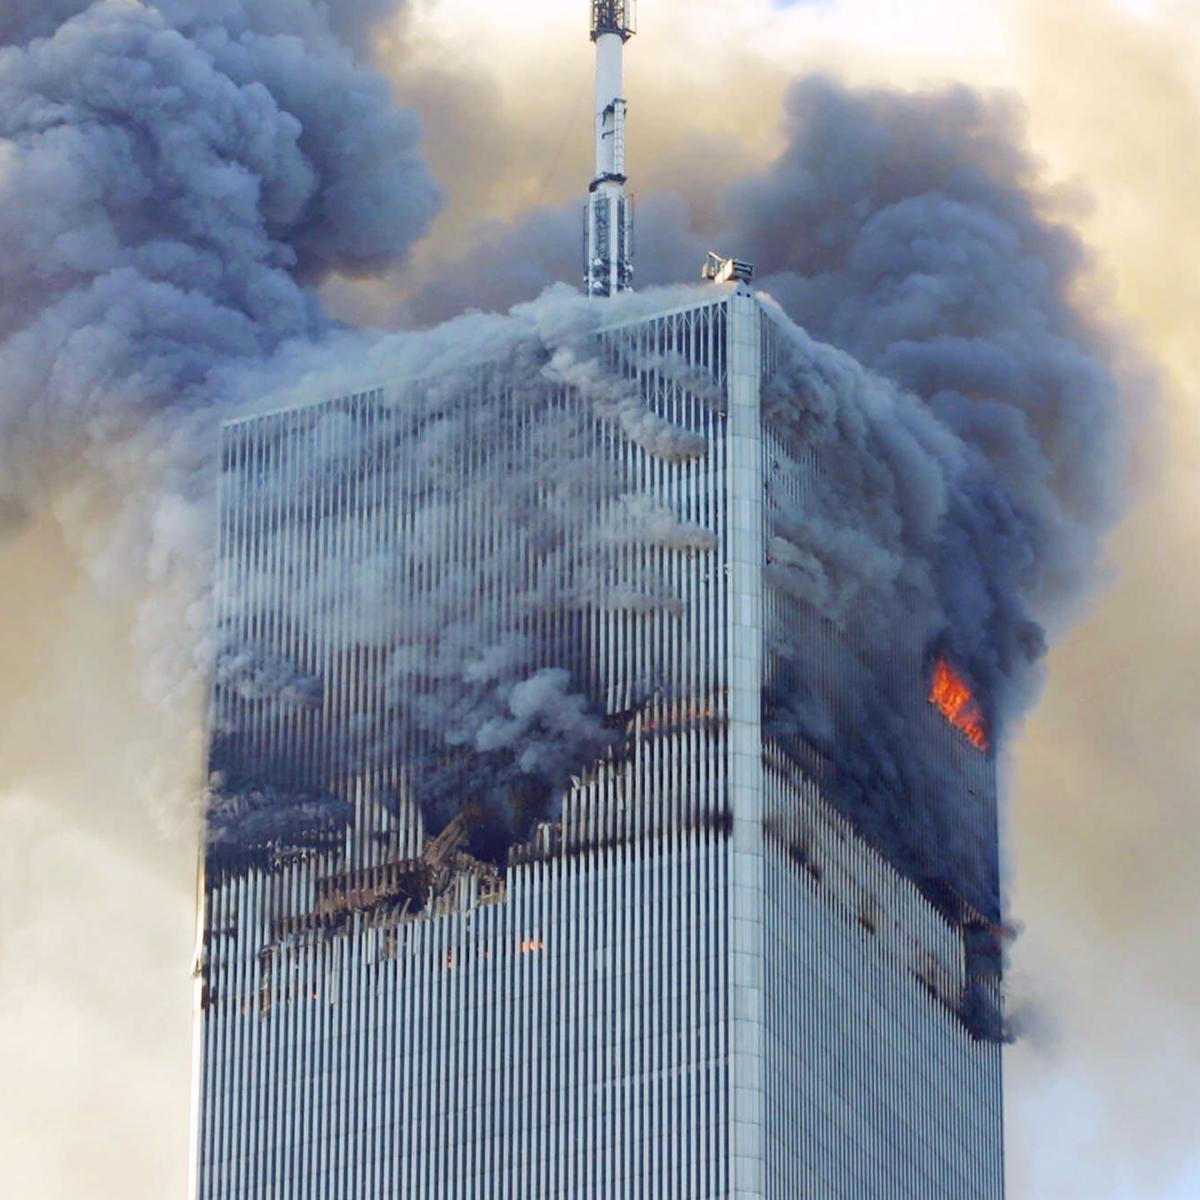 Twin Tower burns